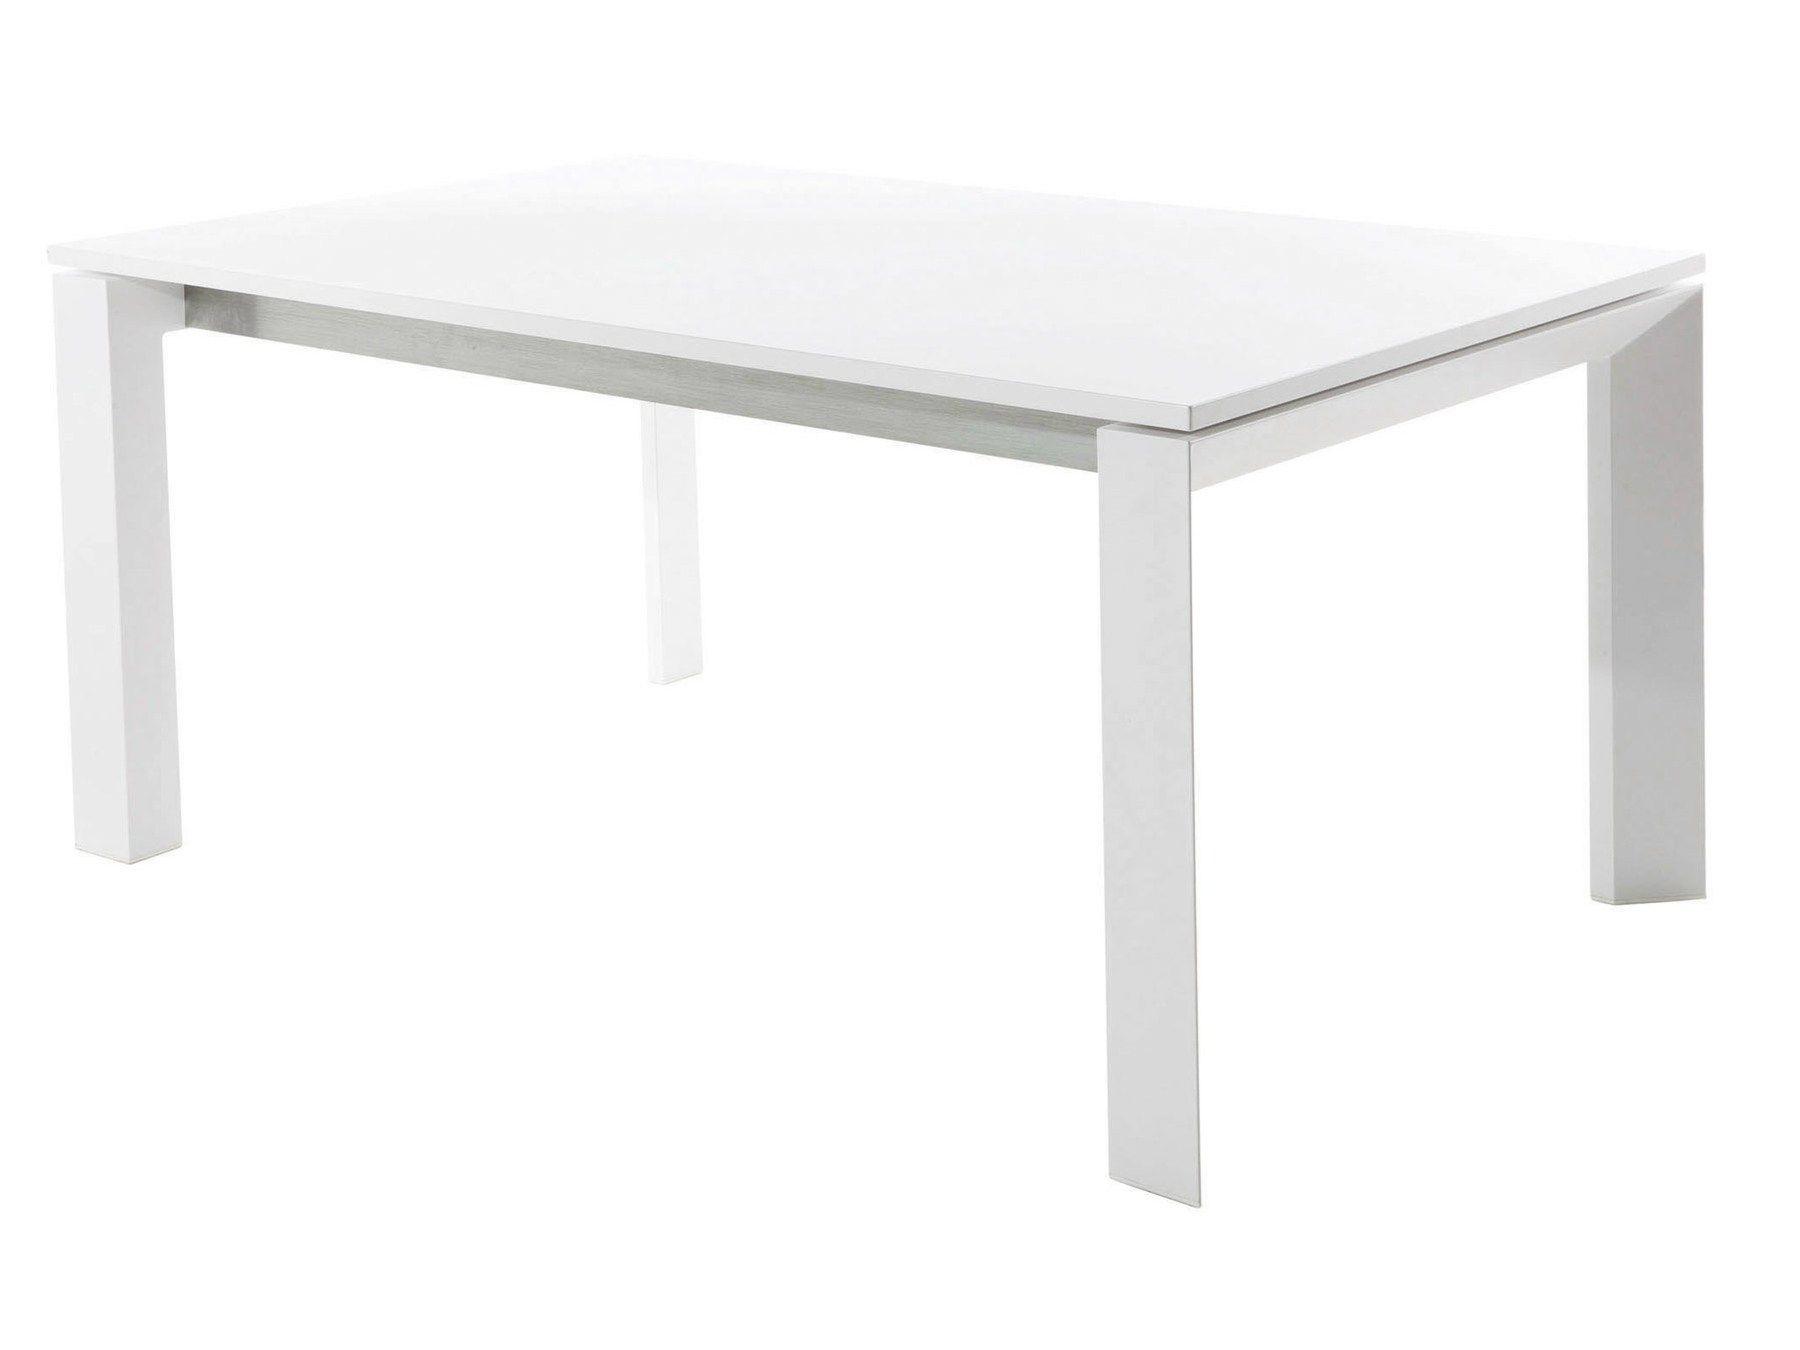 Gartenmobel Weiss Eisen : Ausziehbarer rechteckiger Tisch aus HPL DOLMEN  Tisch  Varaschin